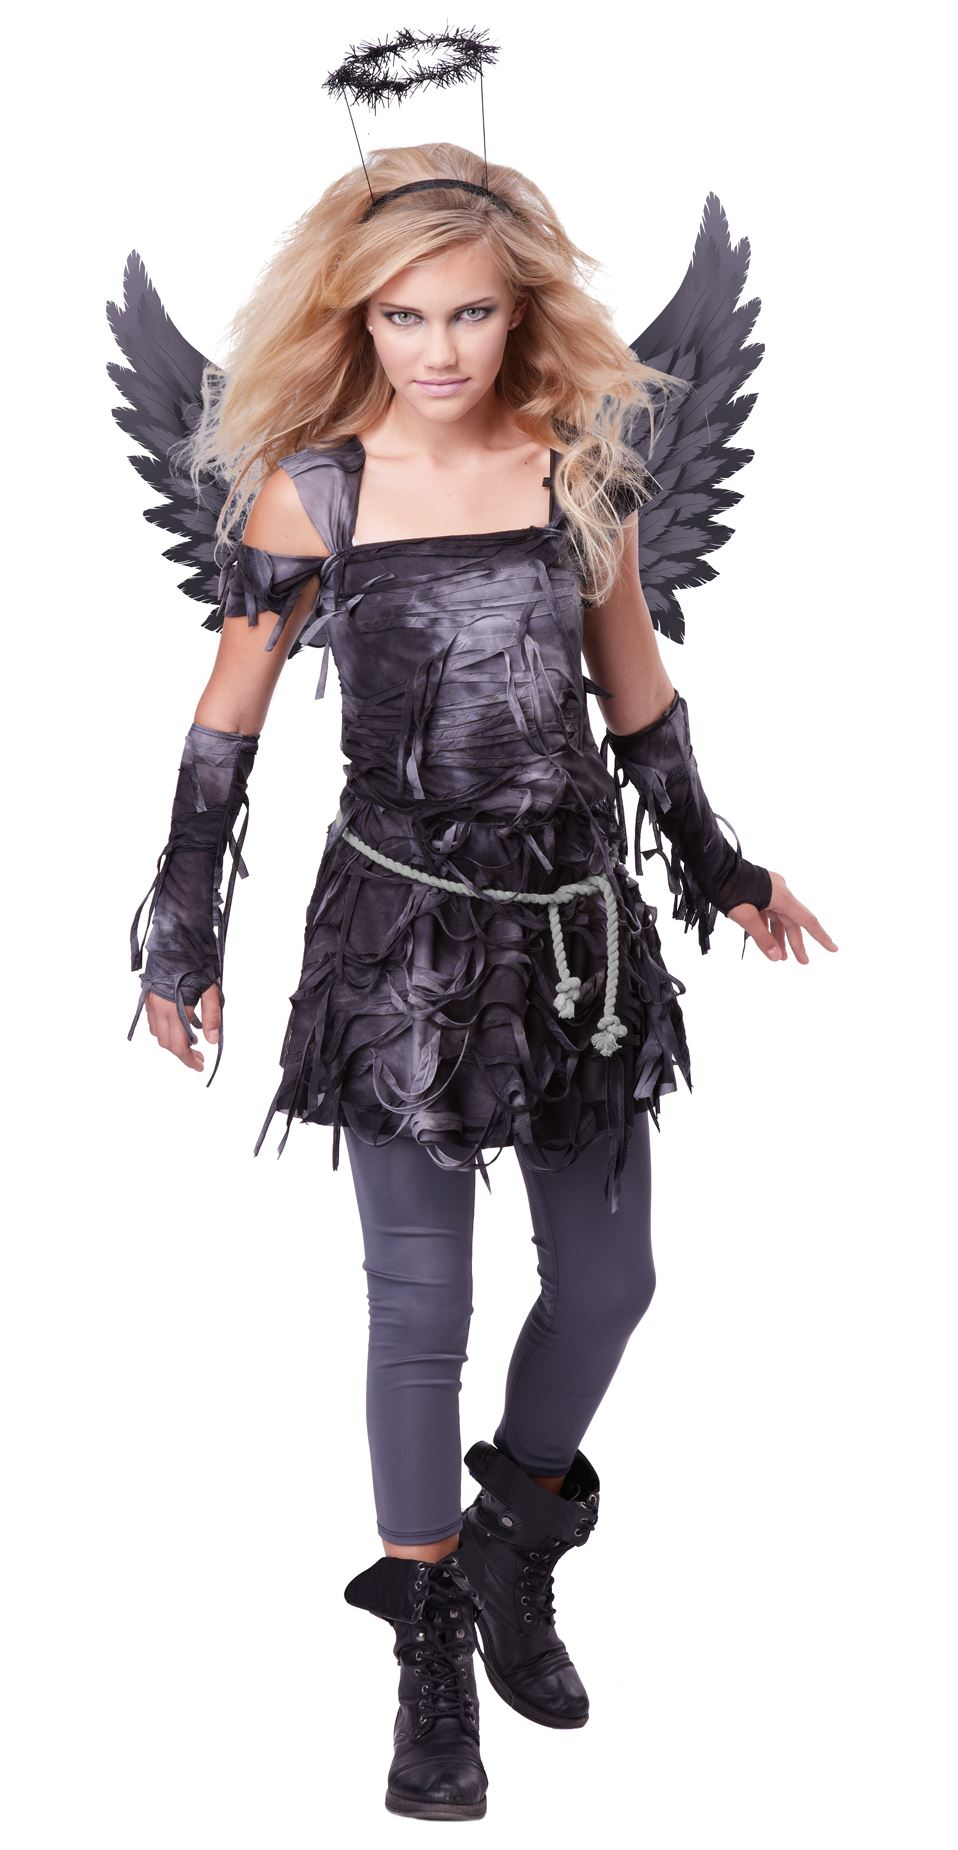 Girls Angel & Fairy Costumes Halloween Costumes | Buy Girls Angel ...